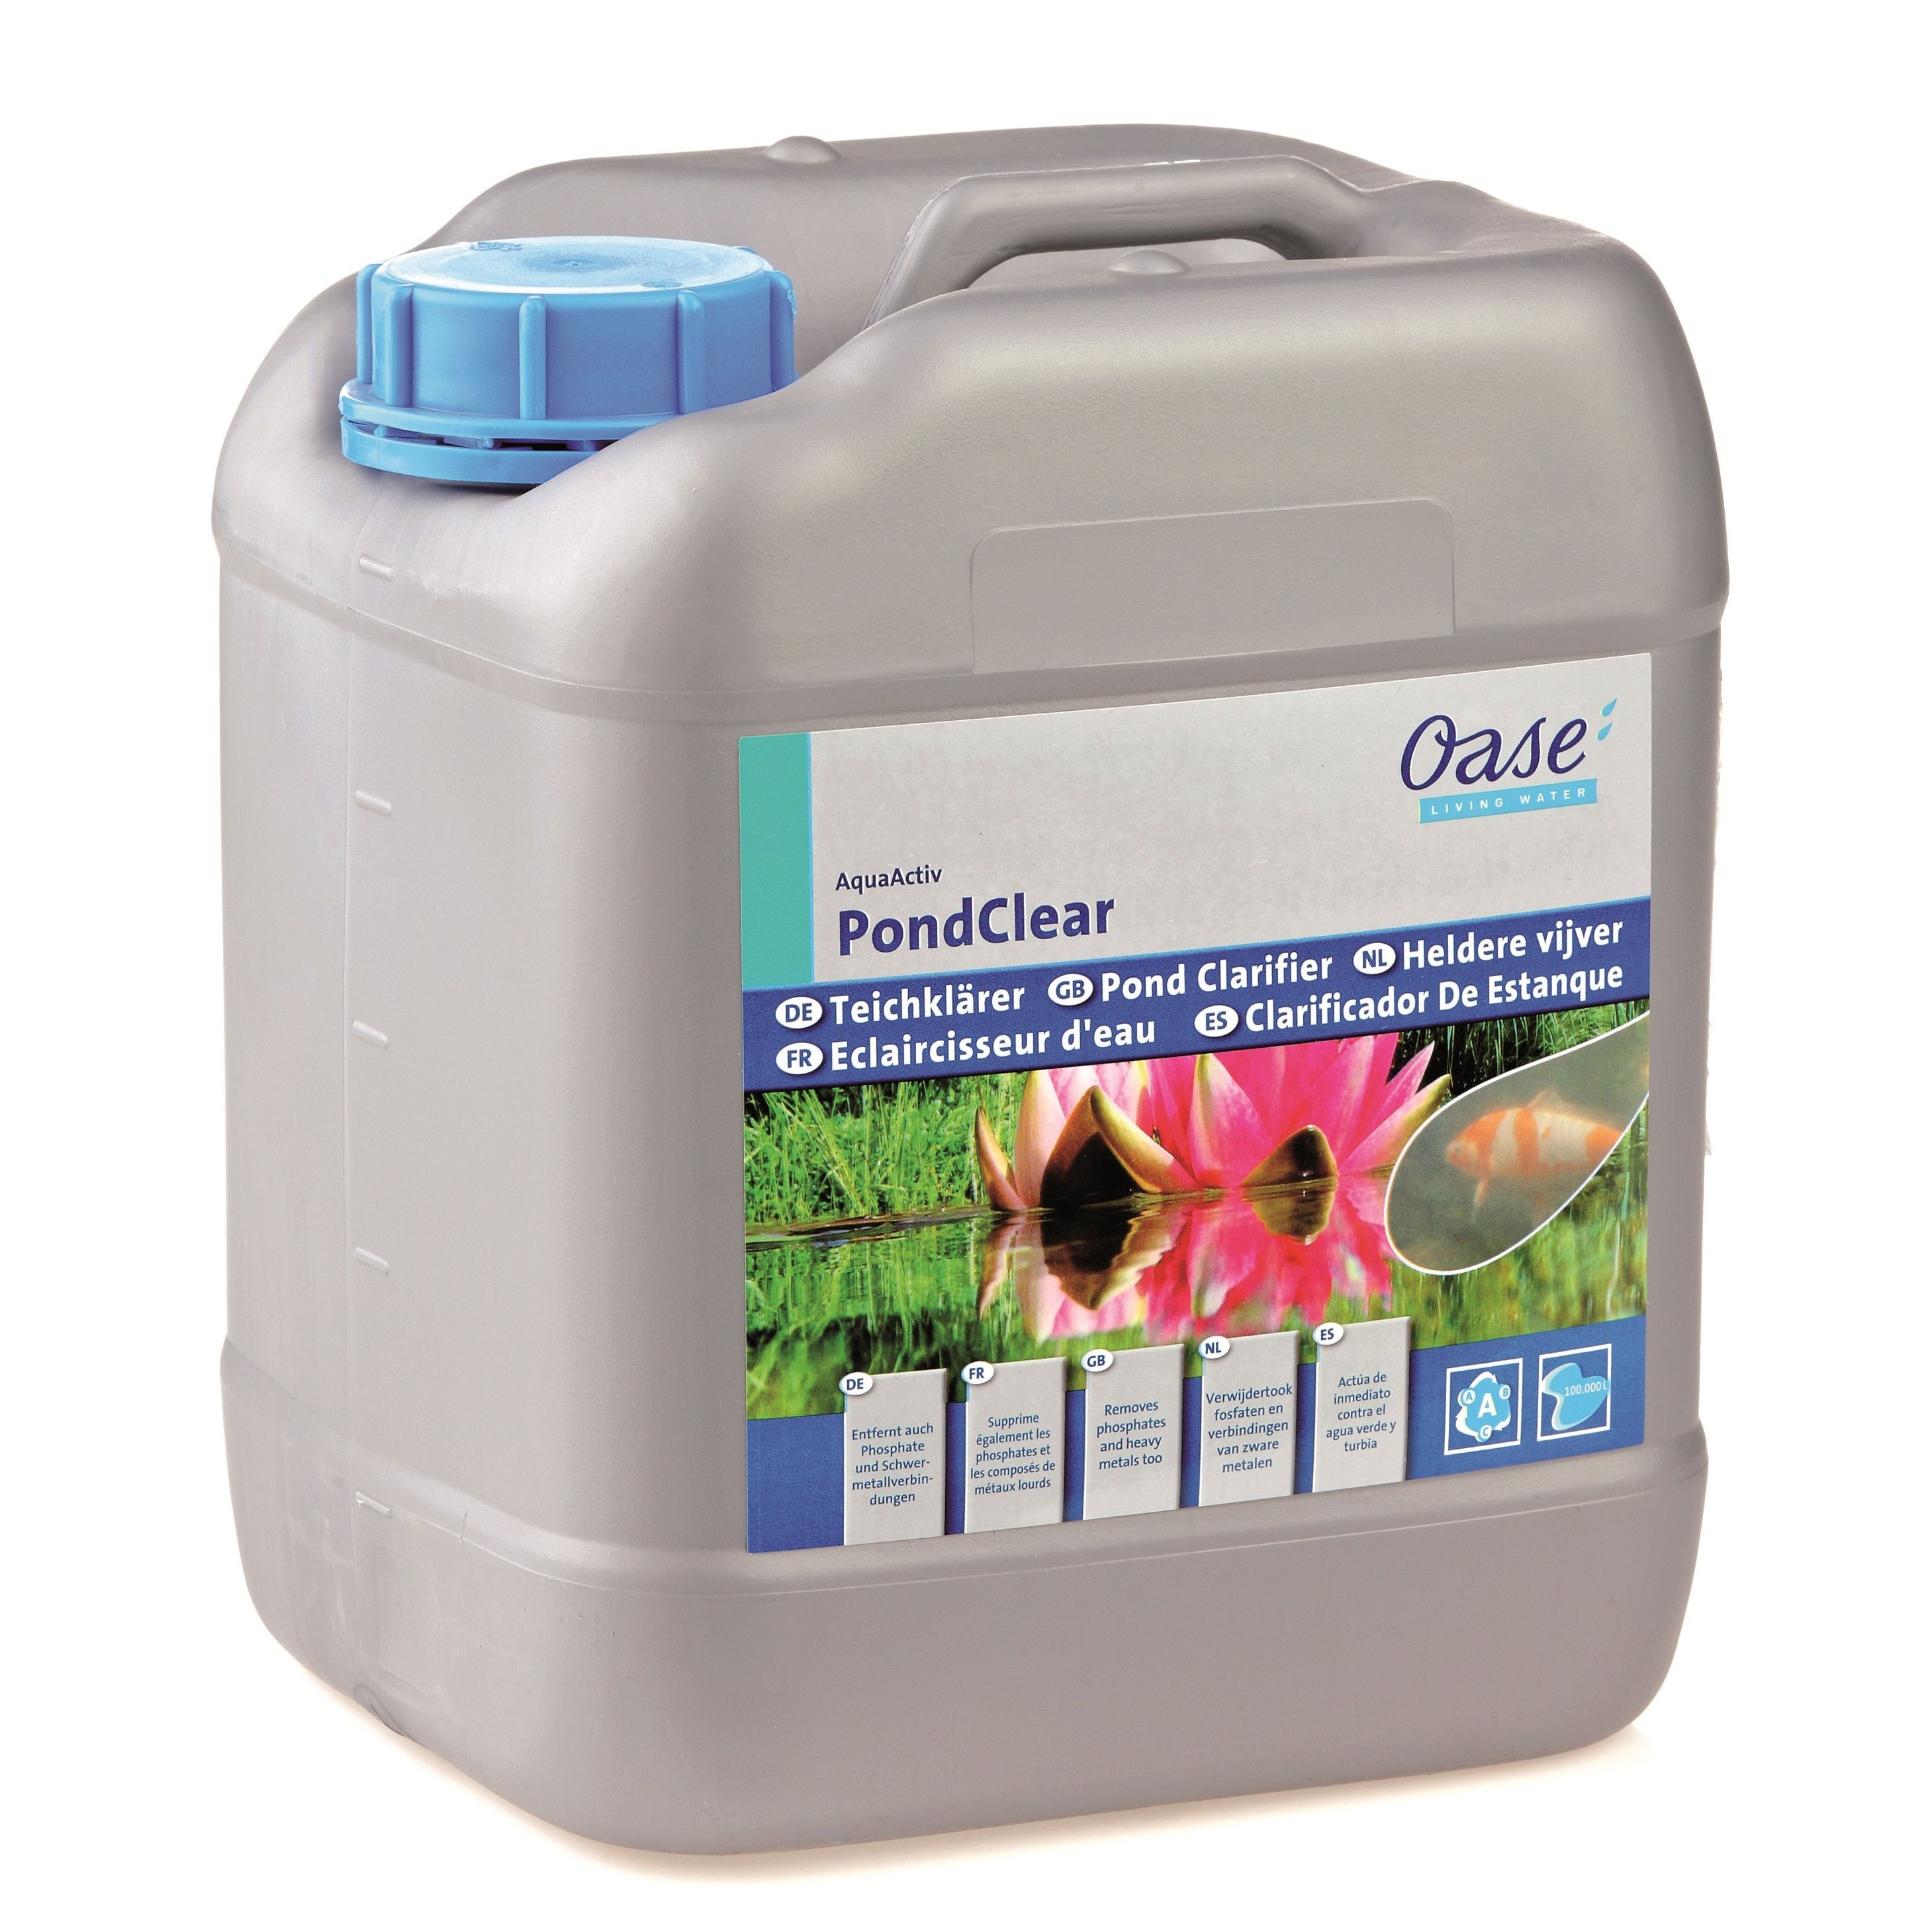 Oase AquaActiv PondClear Teichklärer 5000 ml für 100000 L